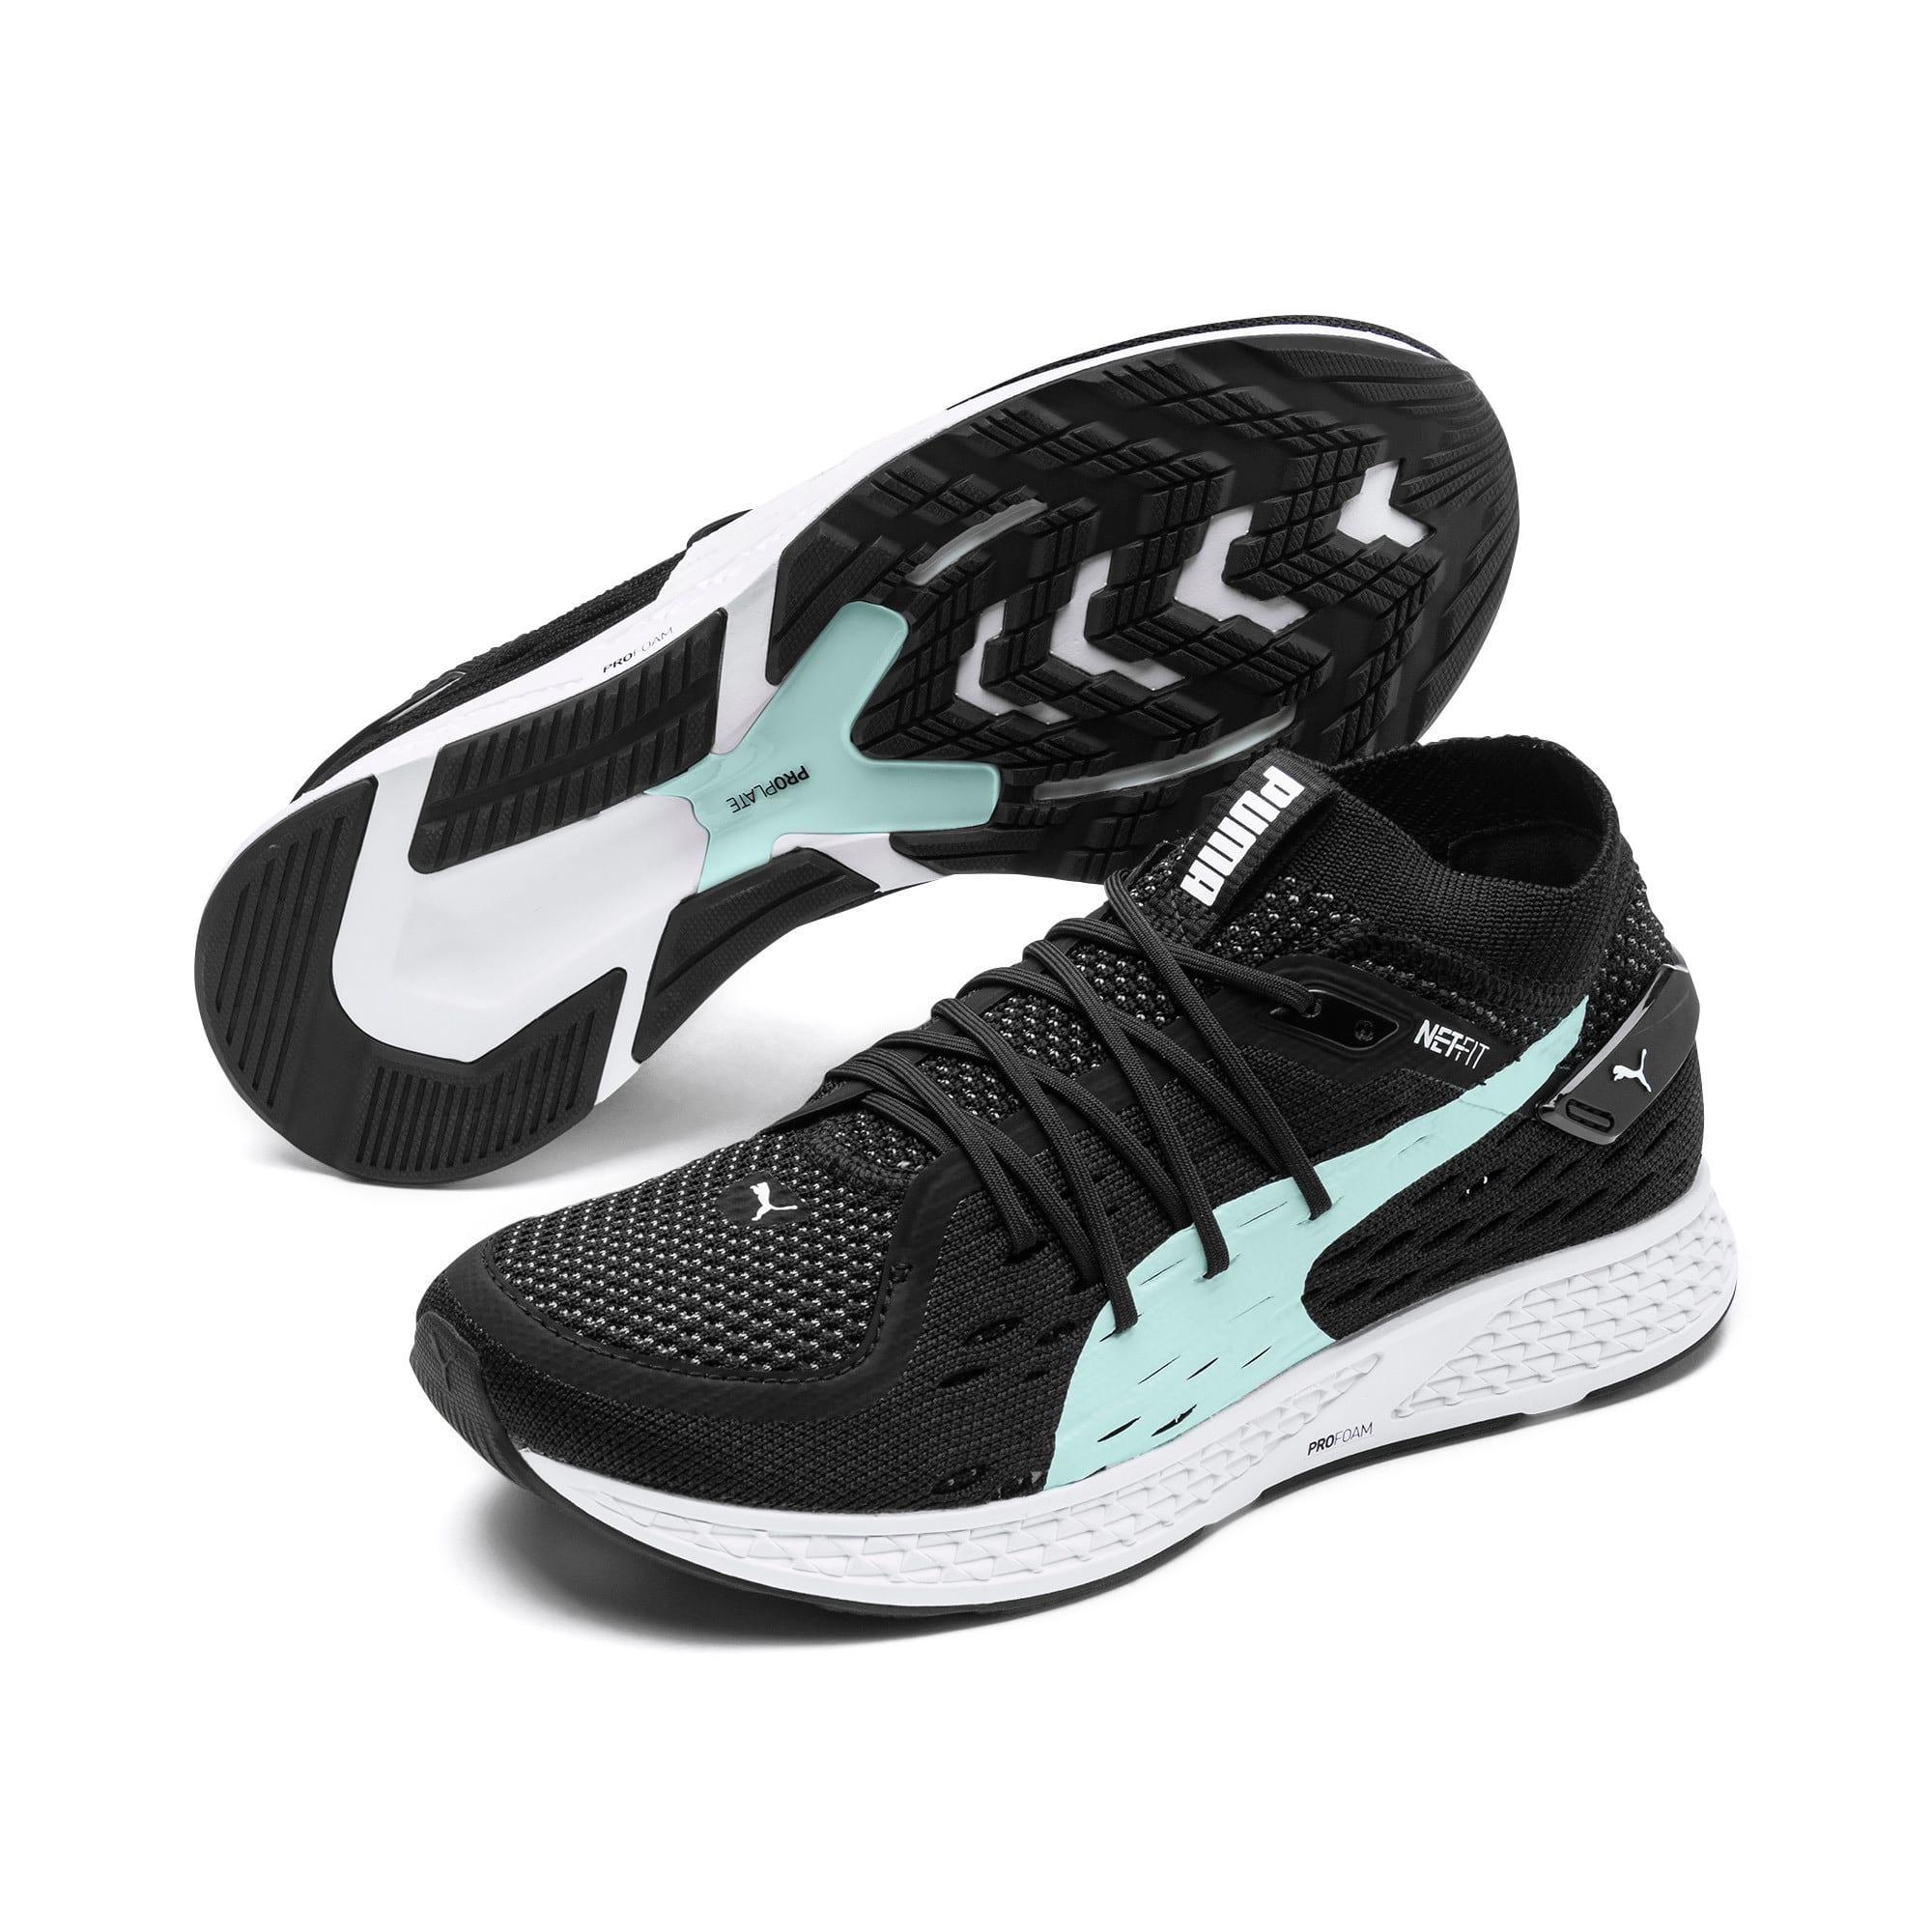 Thumbnail 3 of SPEED 500 Women's Running Shoes, Puma Black-Puma White, medium